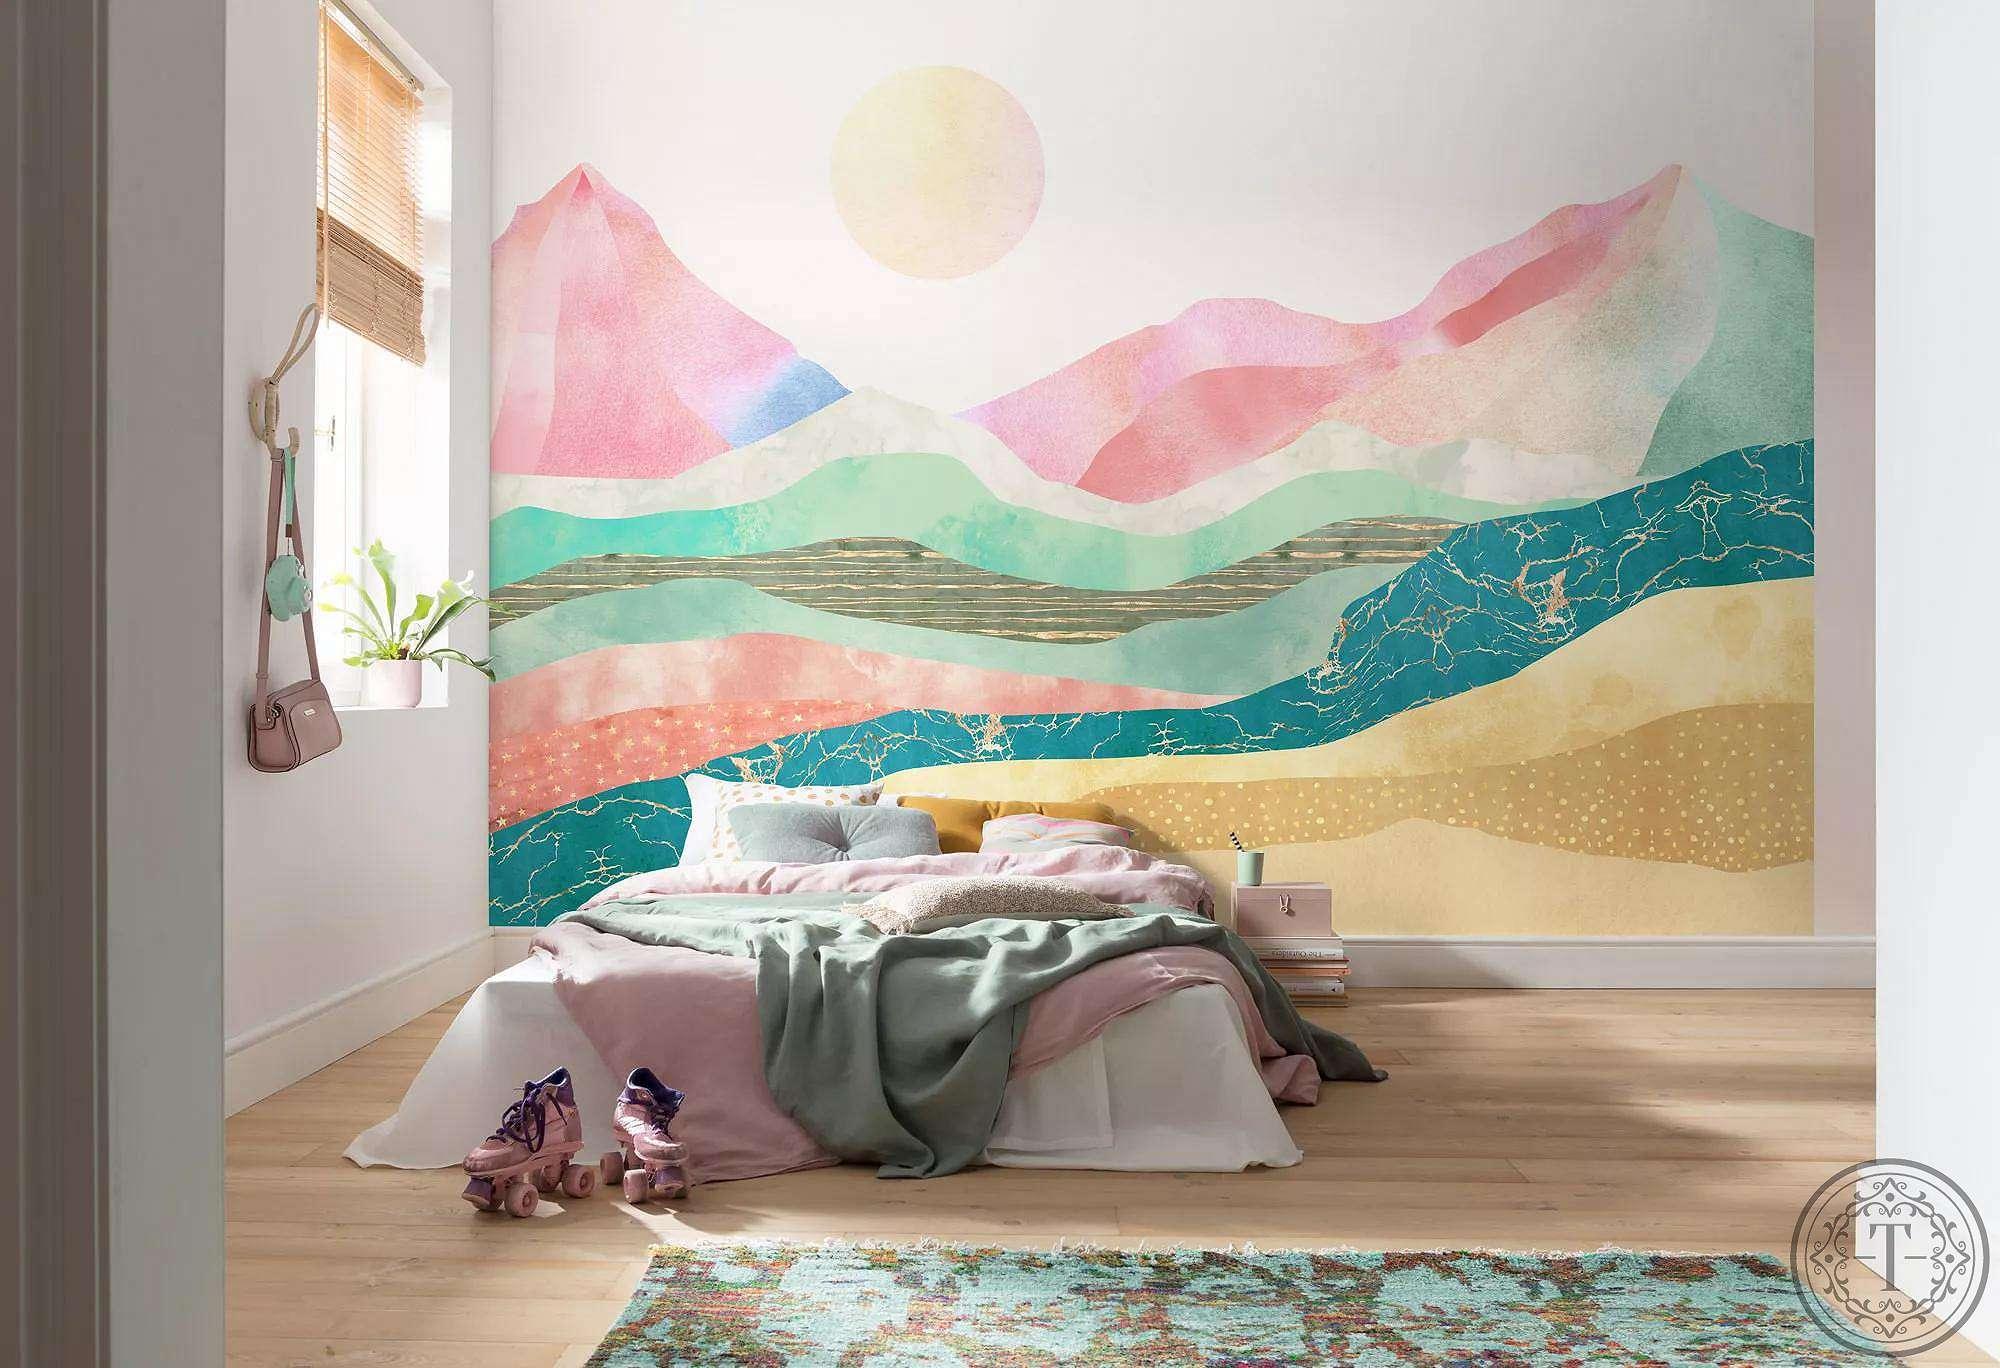 minimalista tapéta természet